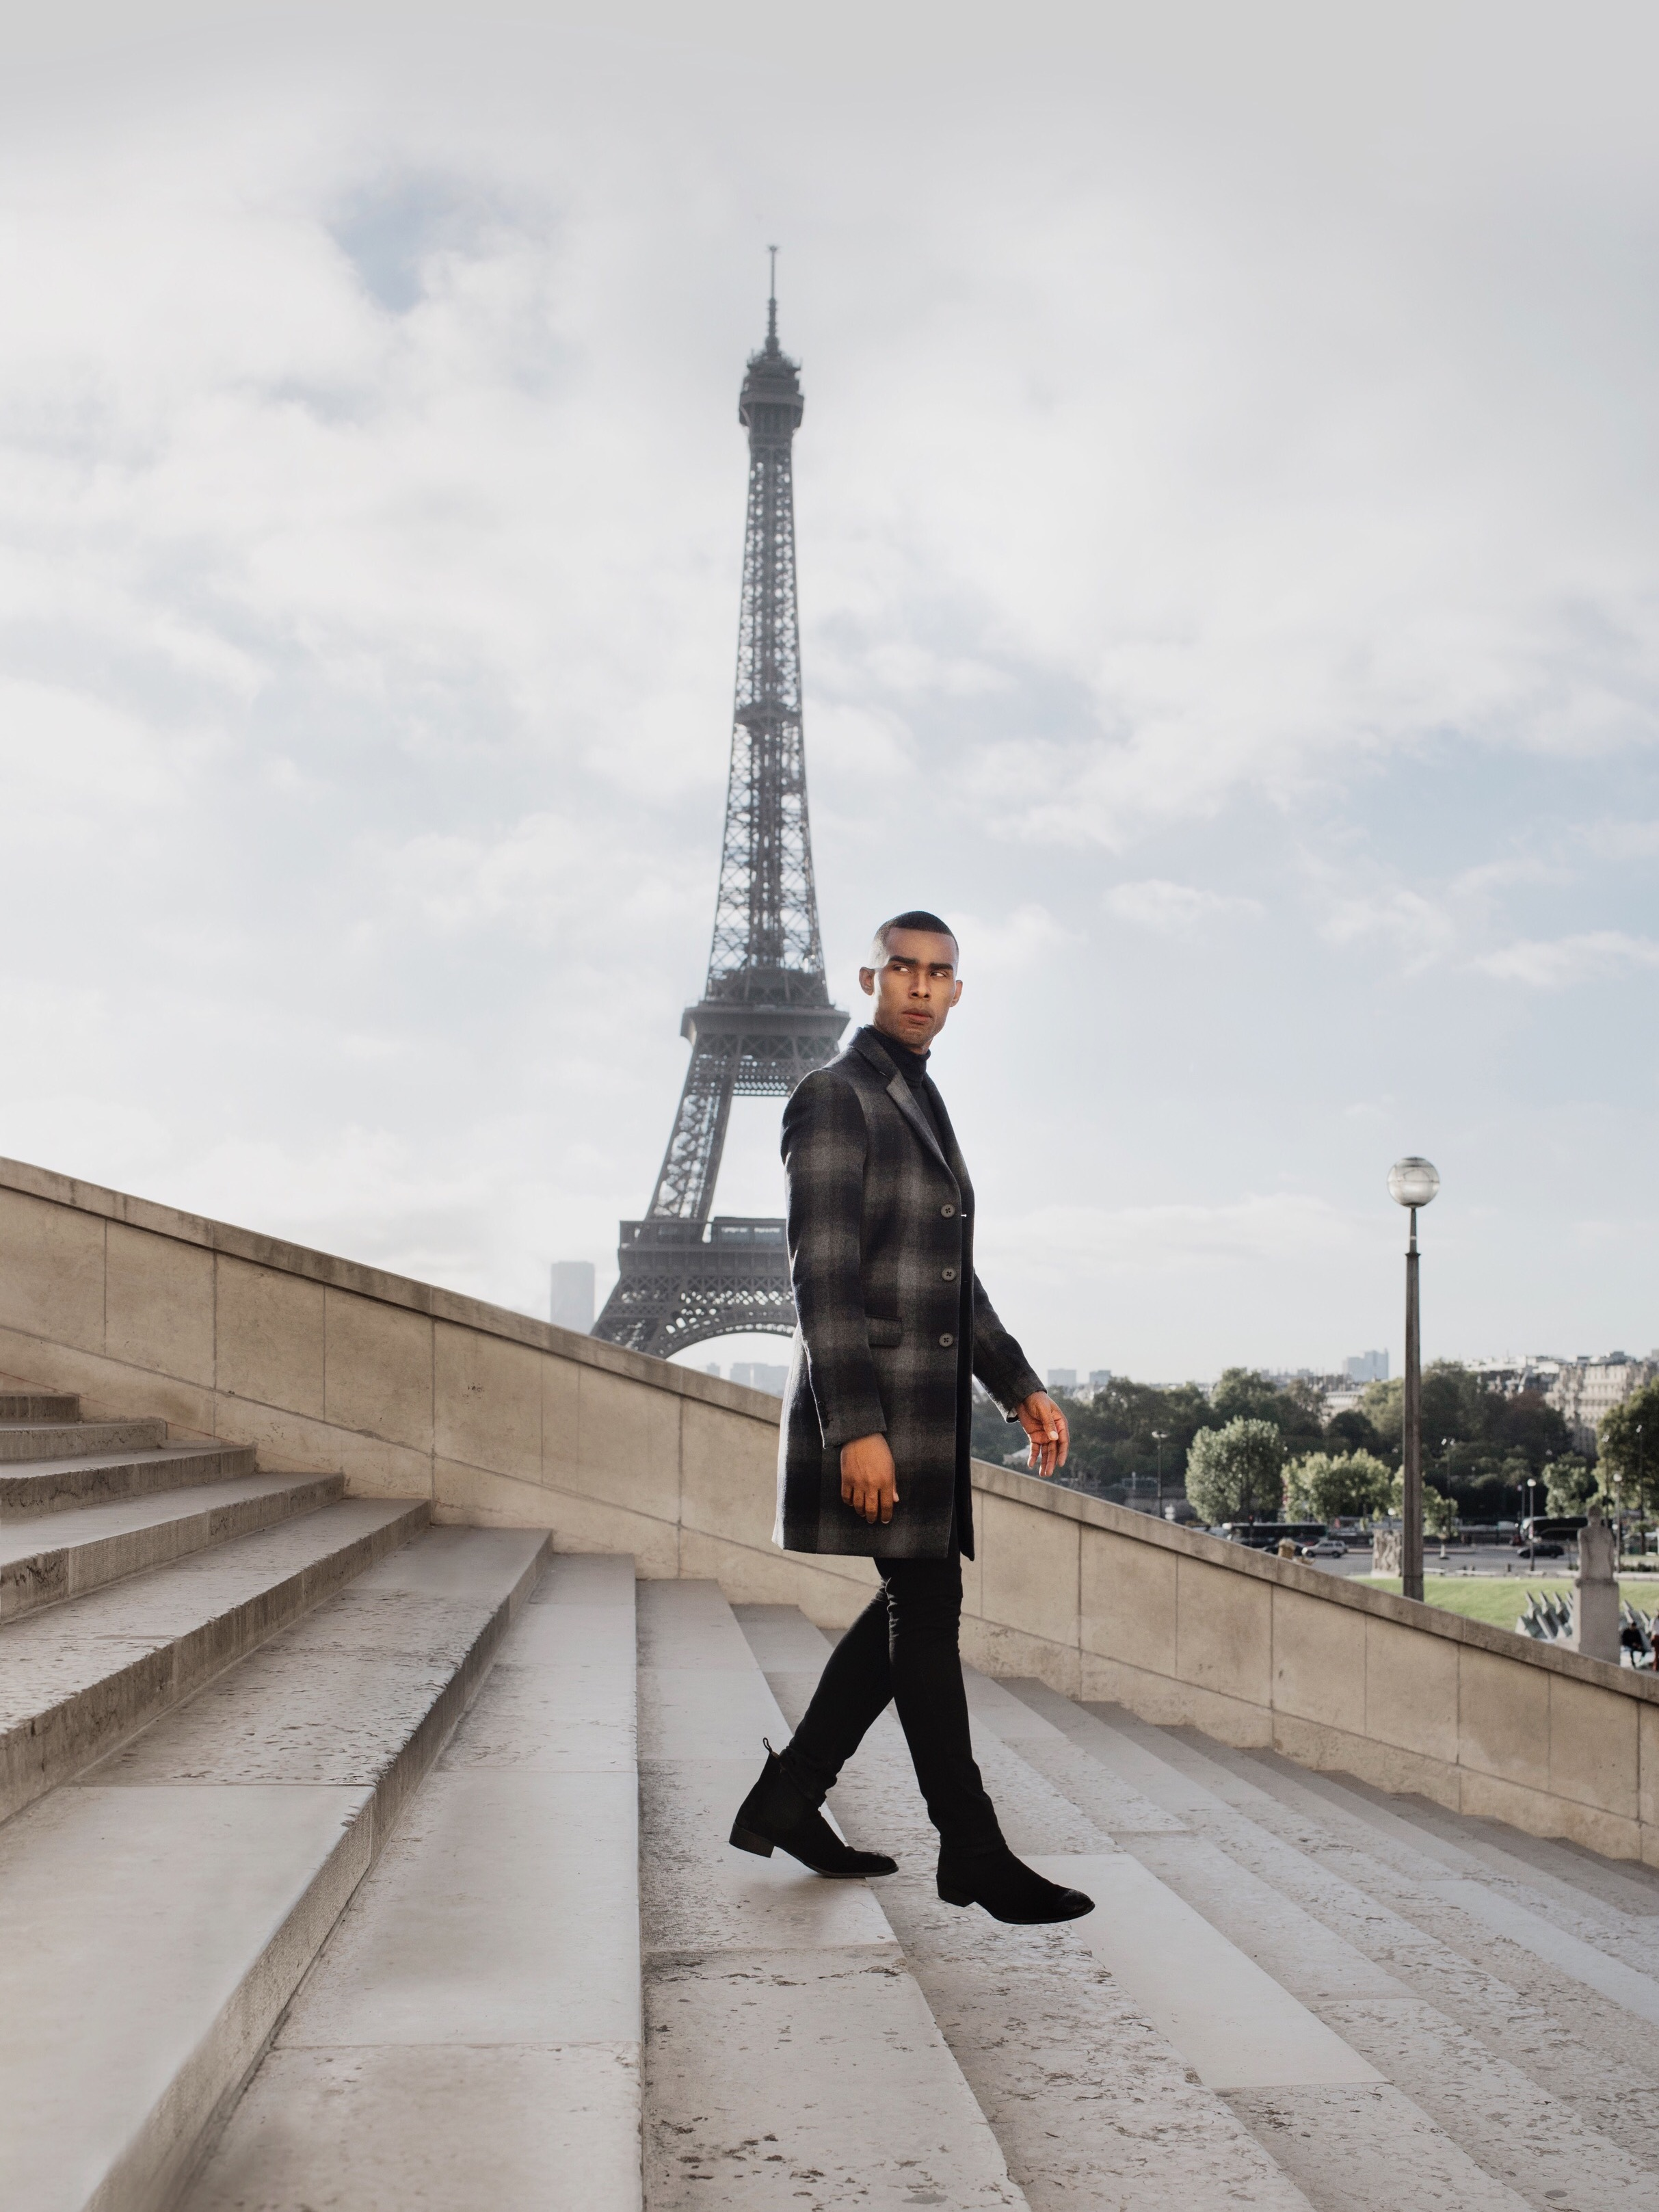 The-Look-Principle-Paris-Fashion-Week-Part2-1.jpg